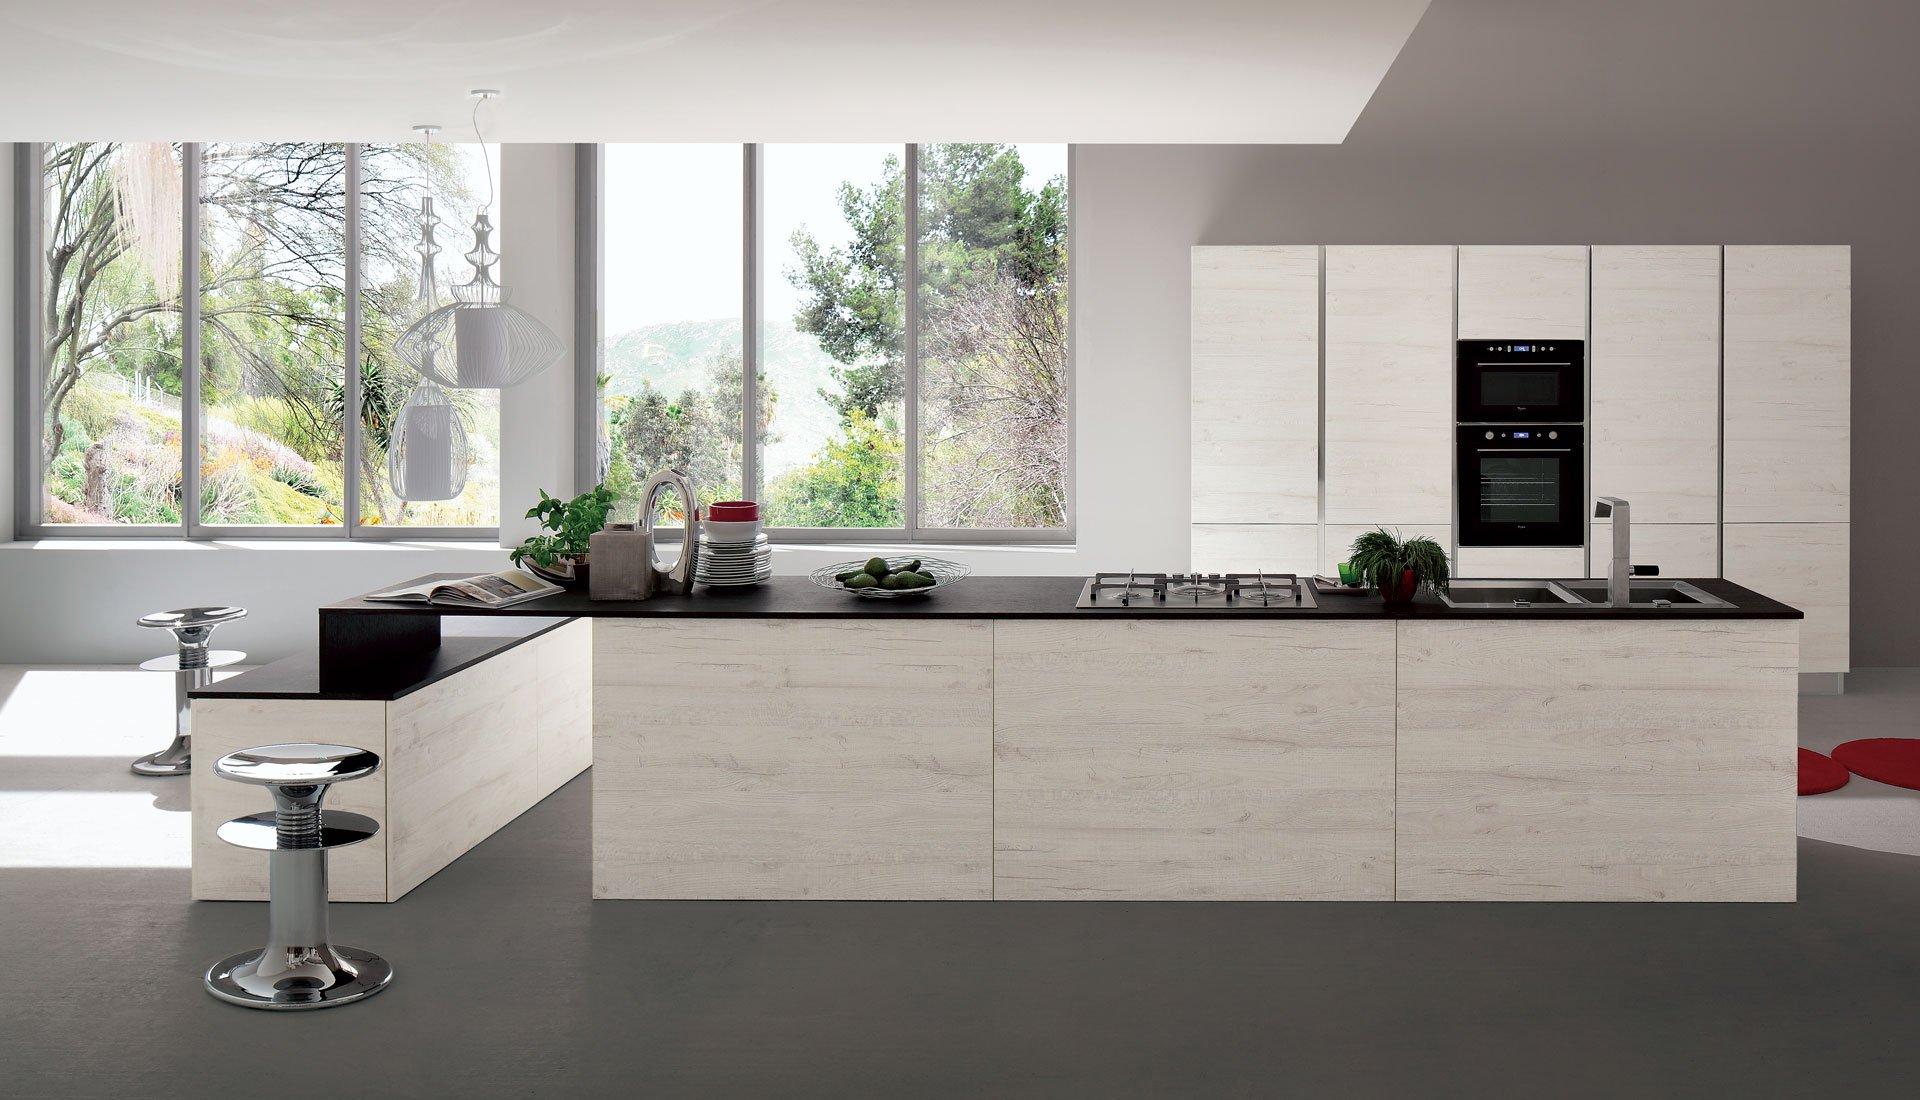 Stunning Cucine Rovere Sbiancato Moderne Contemporary - Design ...